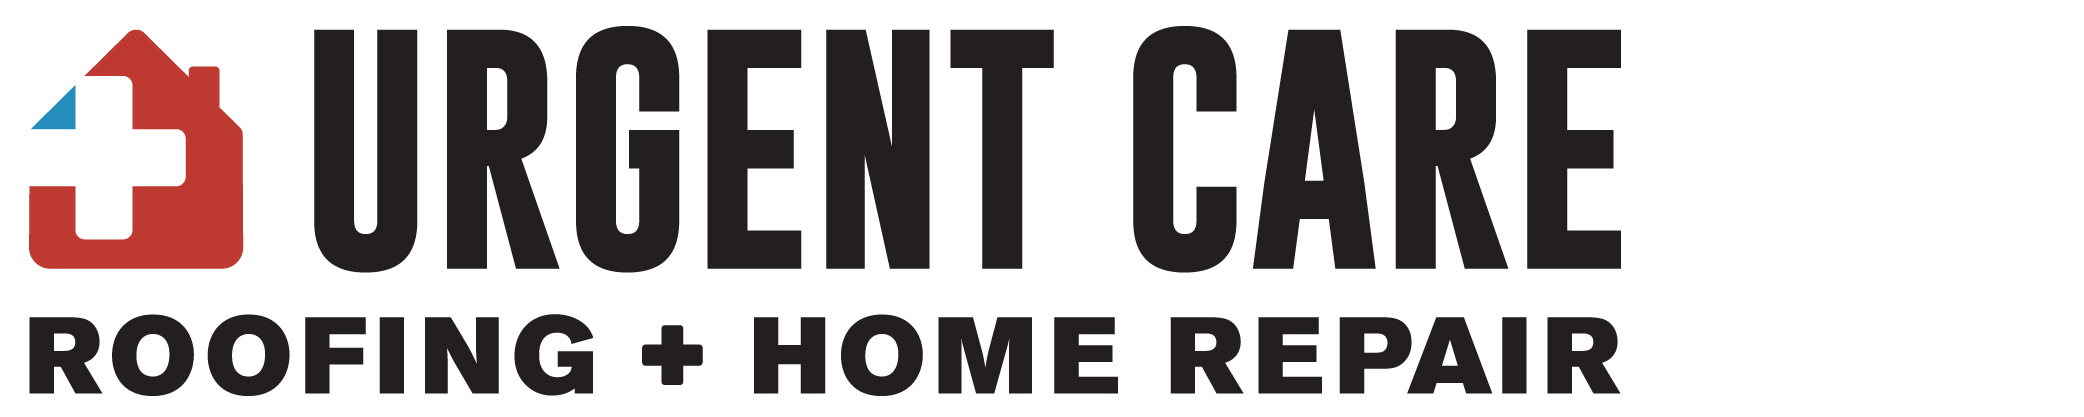 urgent care header logo